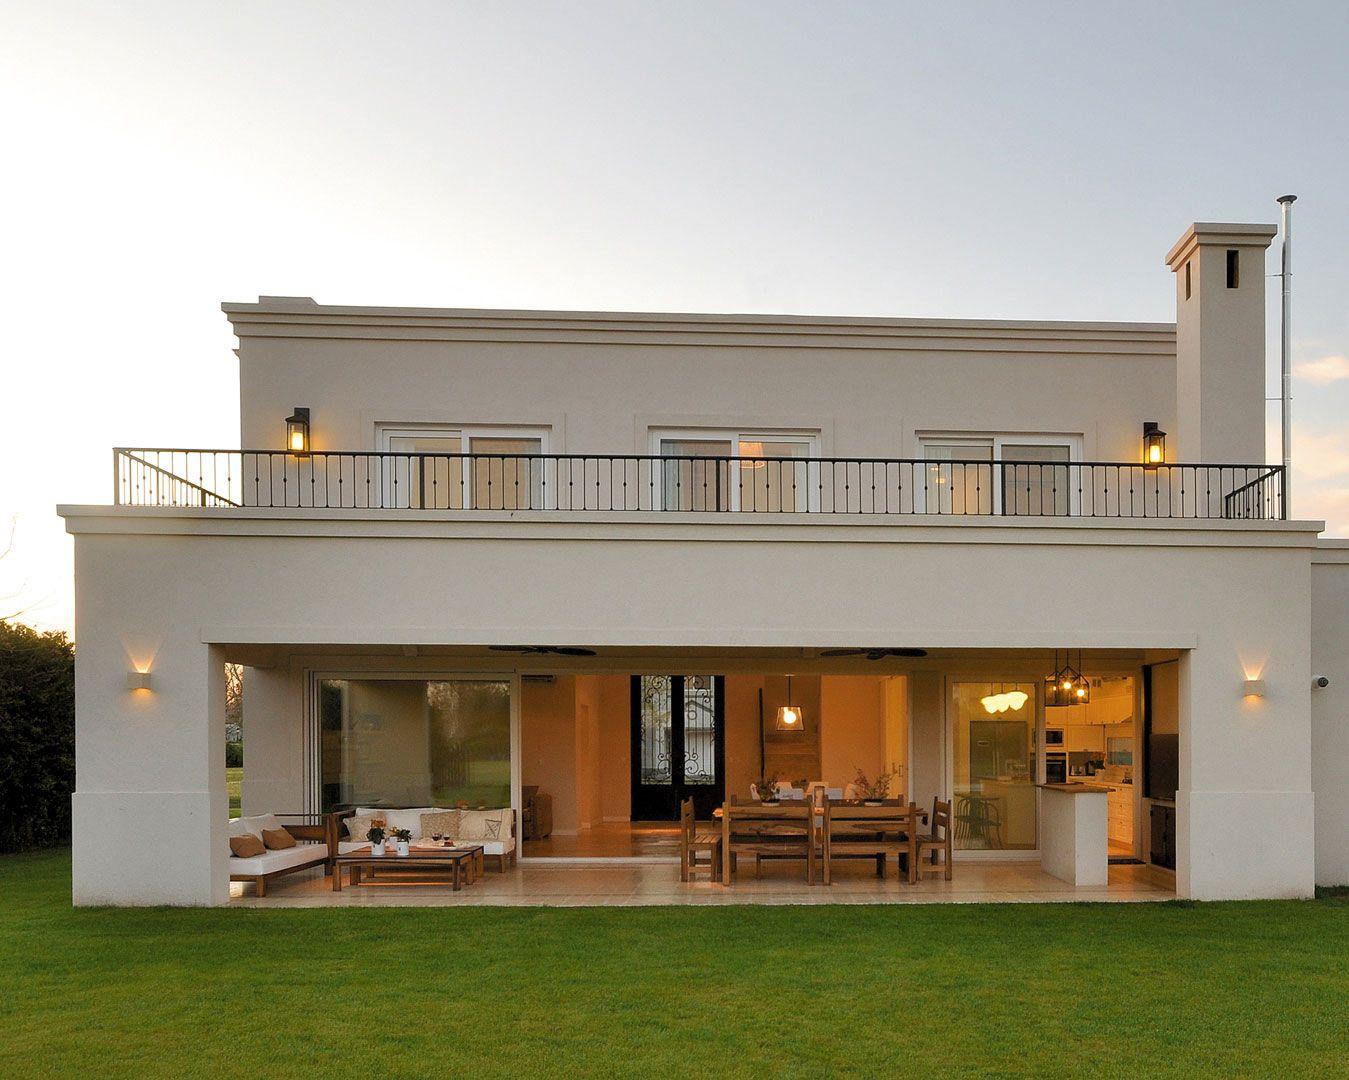 marcela parrado arquitectura casa 12 en 2019 casa On portal de arquitectos casa de campo